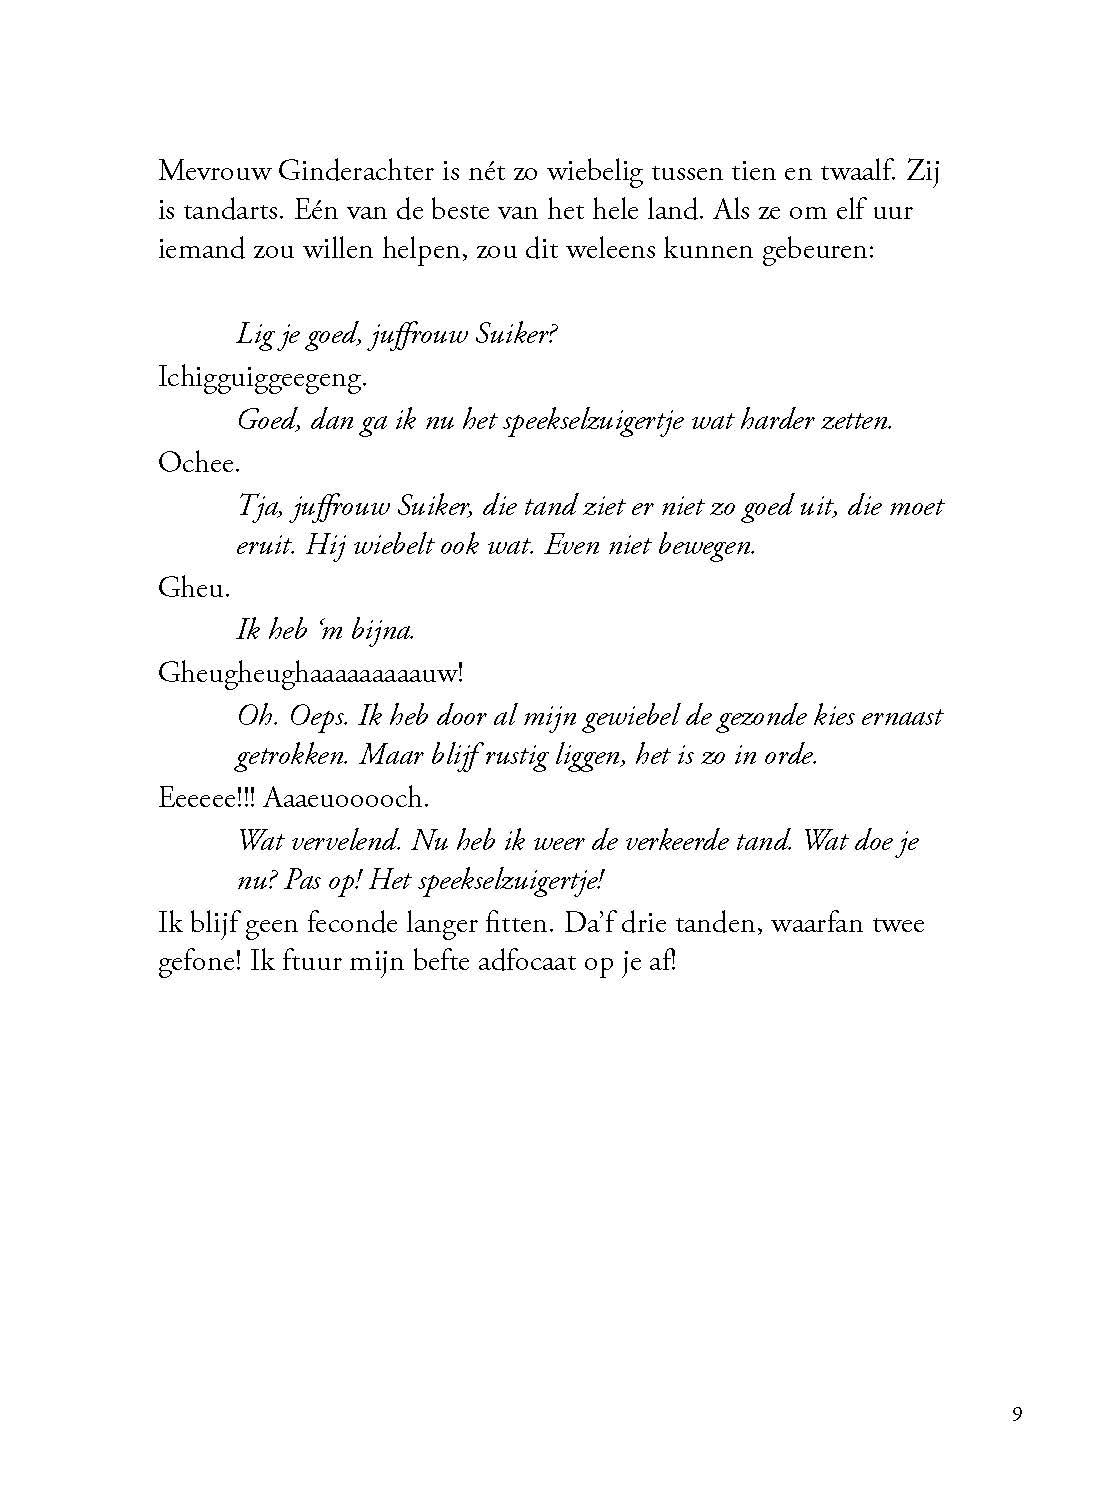 Mevrouw Moes pagina 5